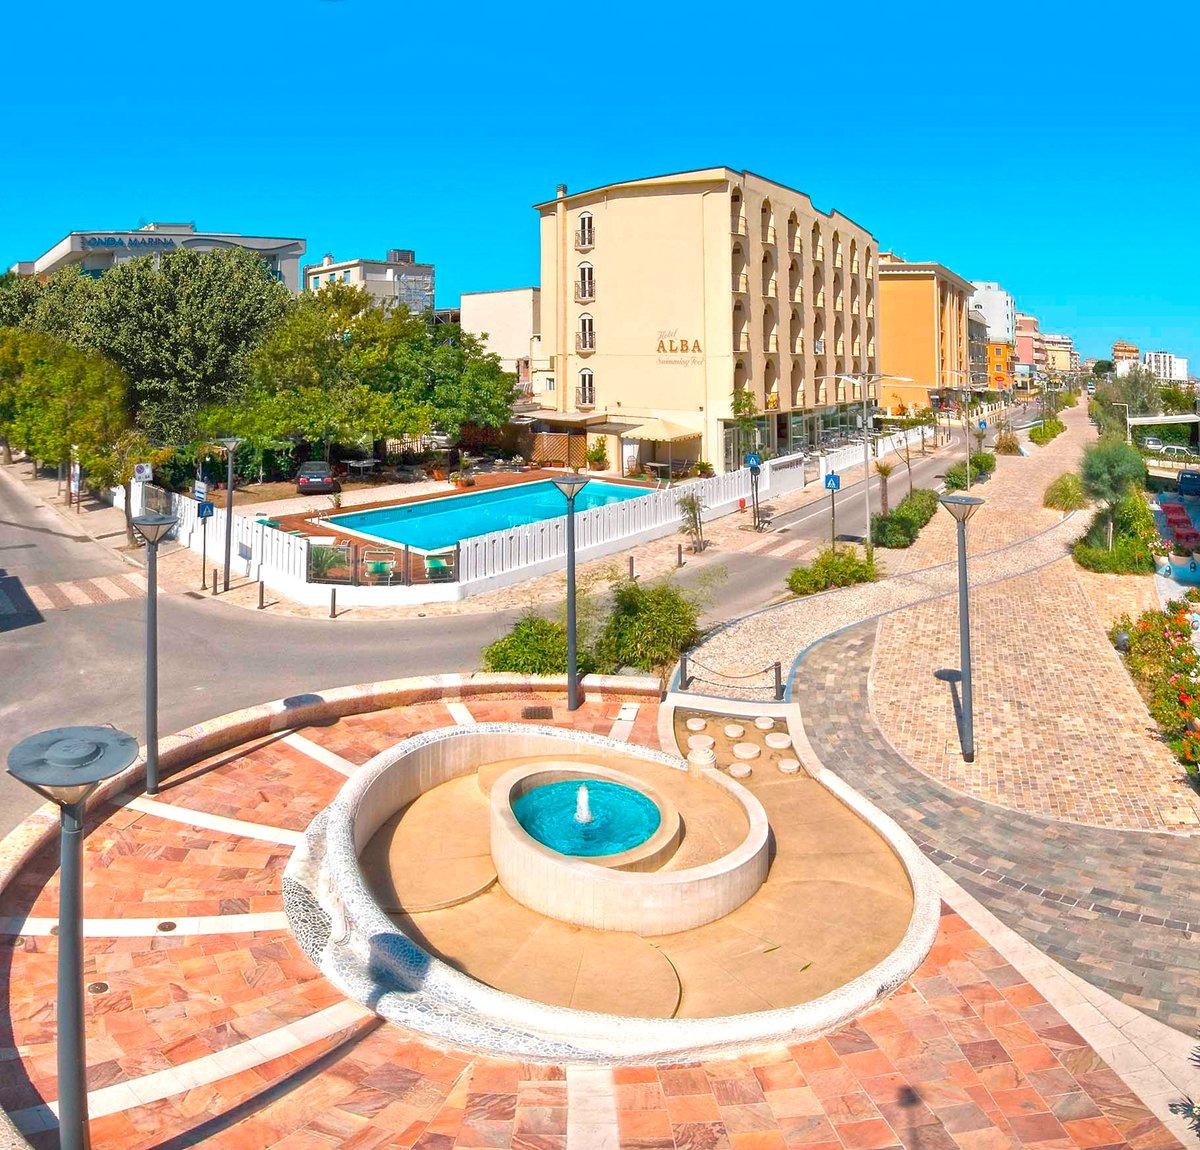 HOTEL ALBA | Misano Adriatico